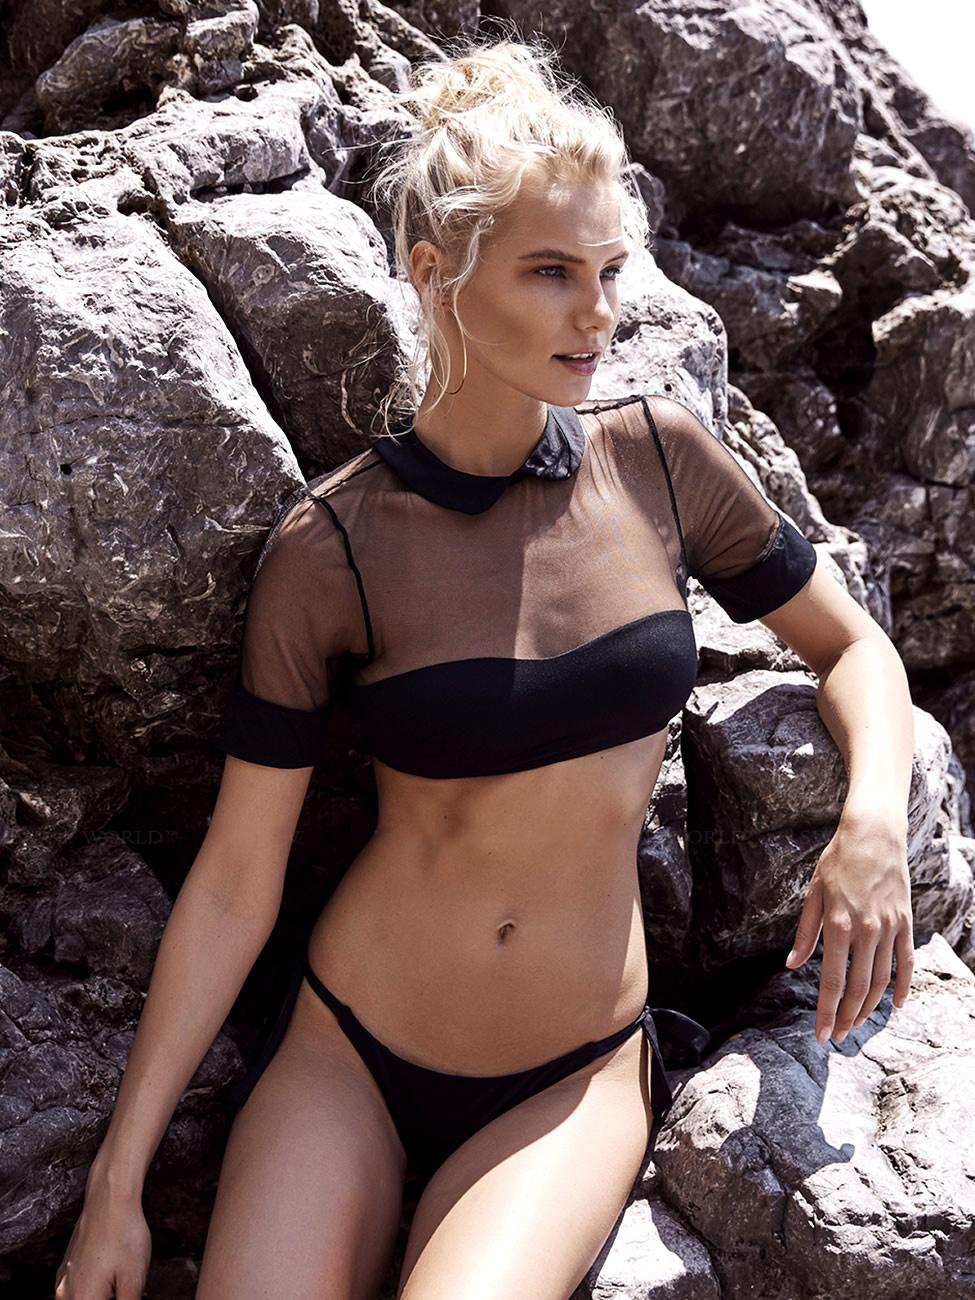 bikini push up brazilian bikini set 2019 Mesh swimsuit women solid halter top bathing suit summer female swimwear